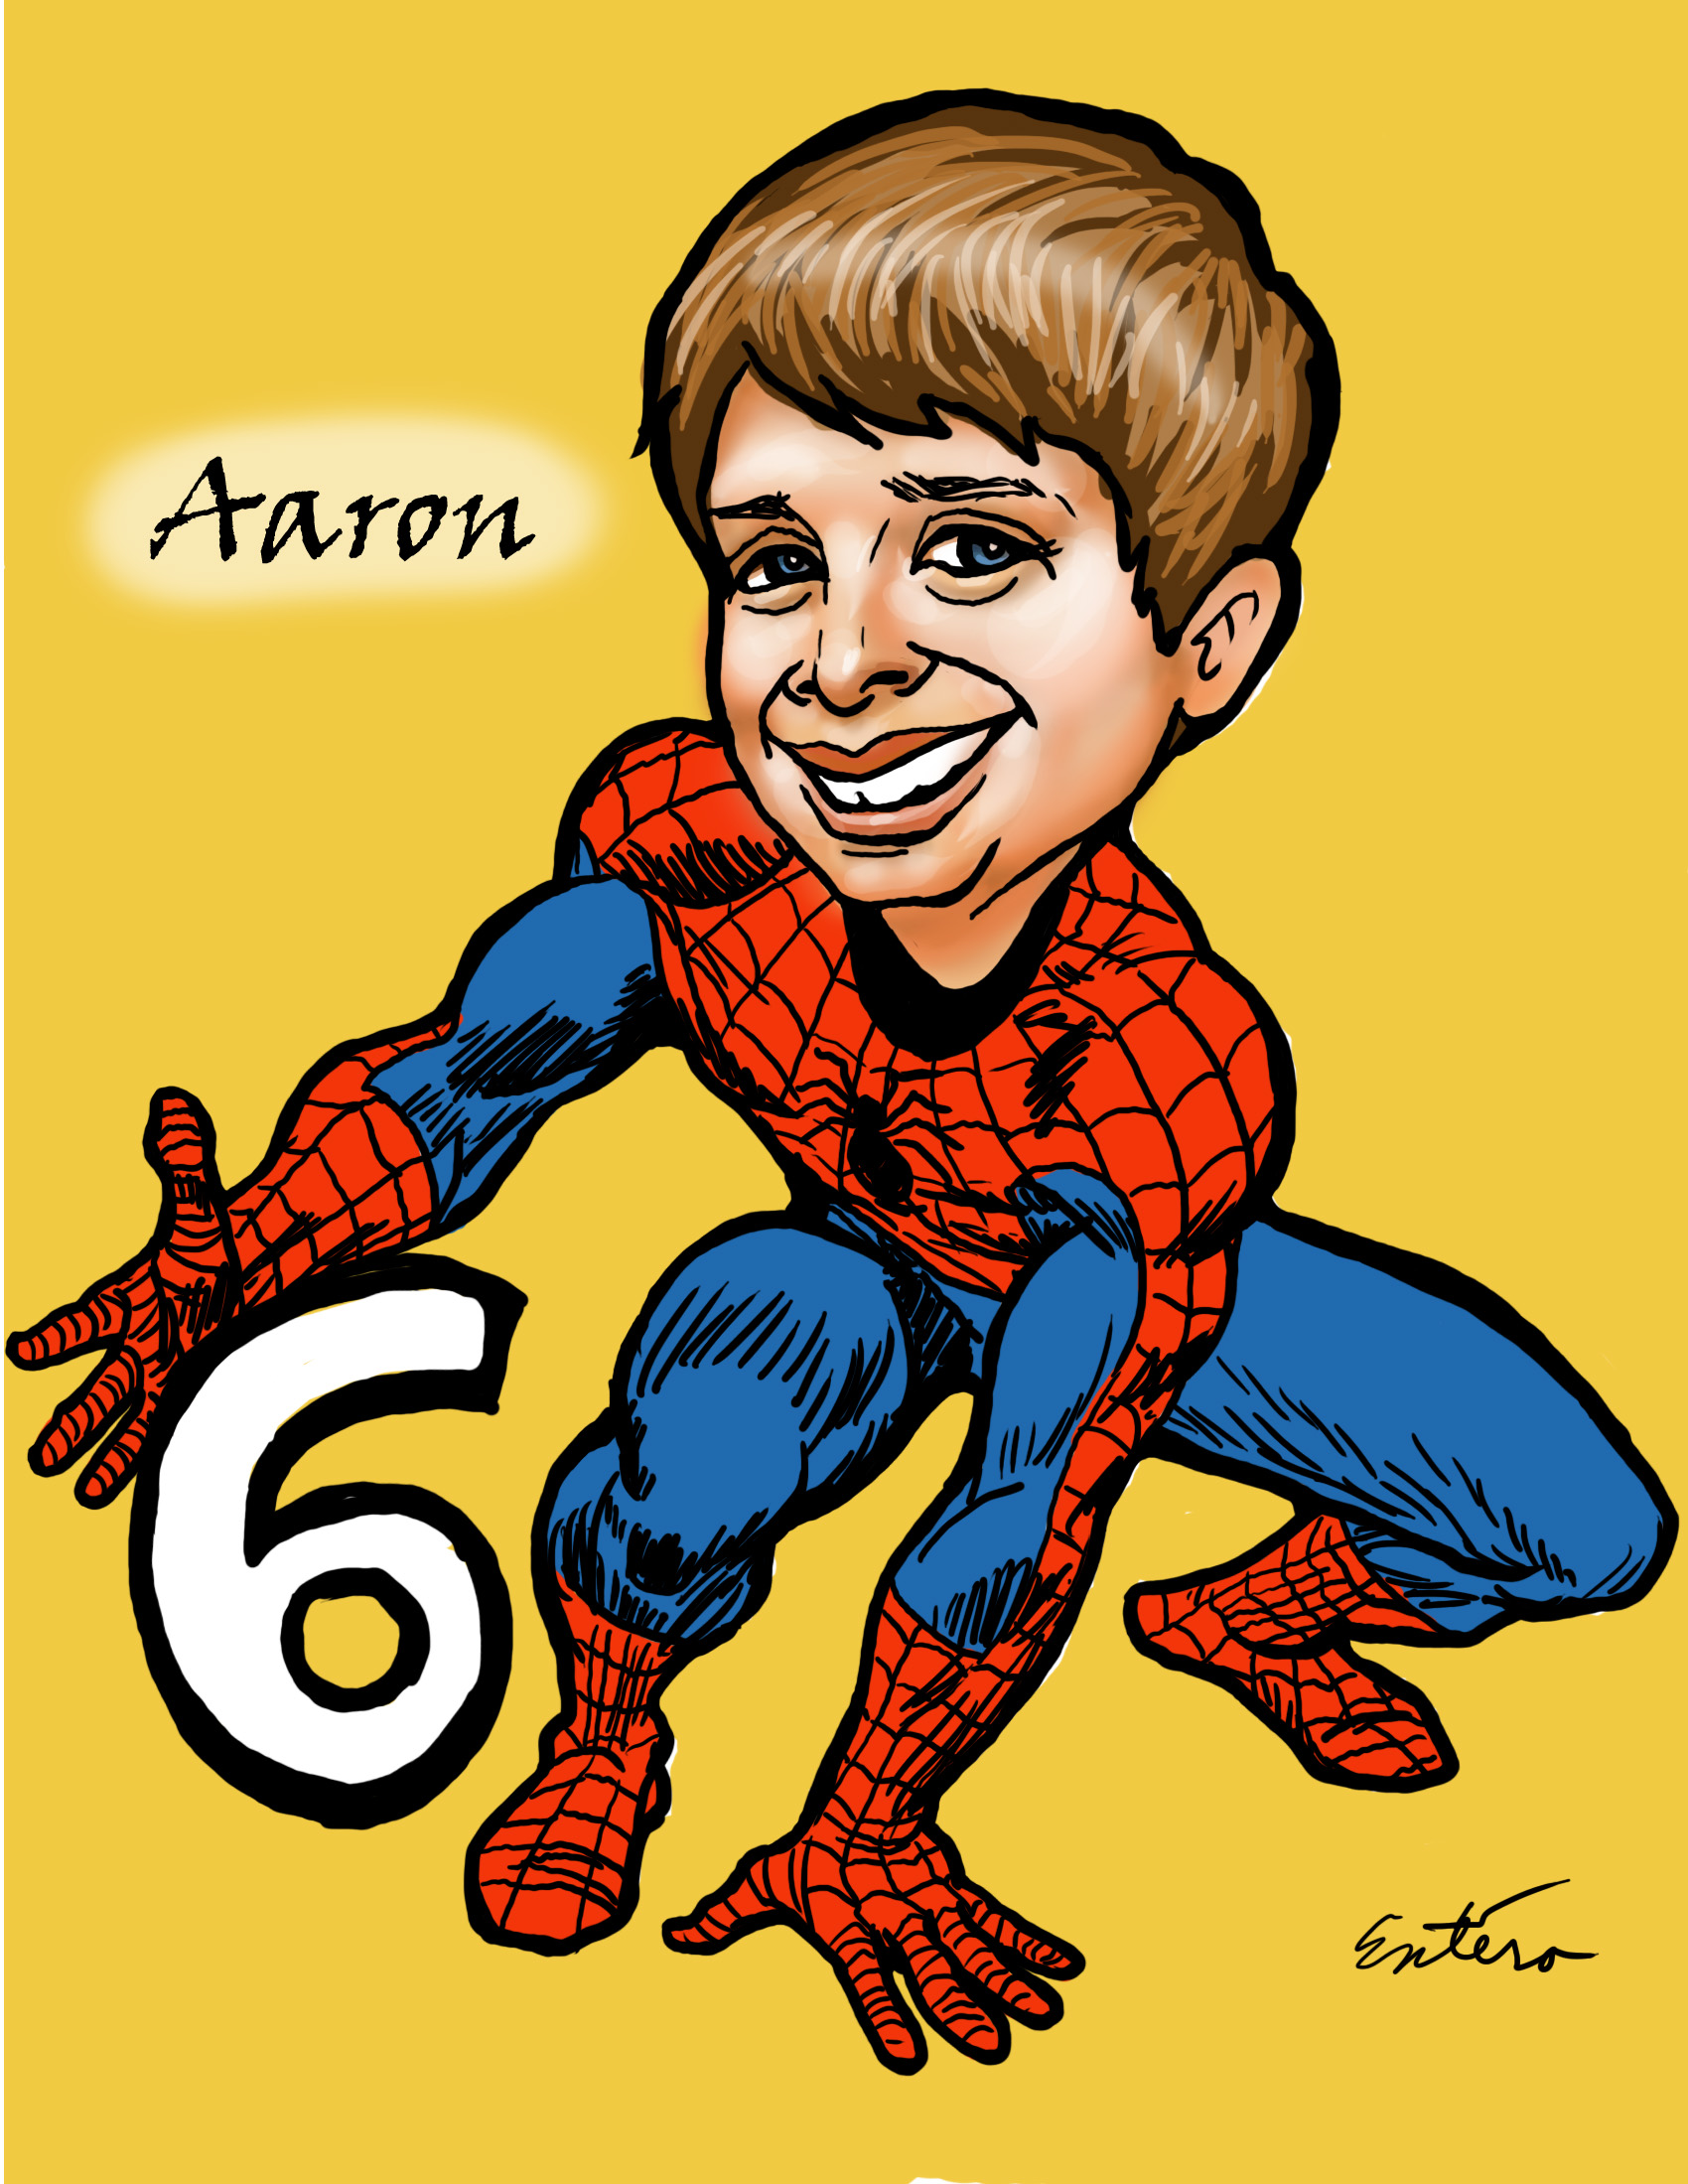 Aaron Spiderman.jpg